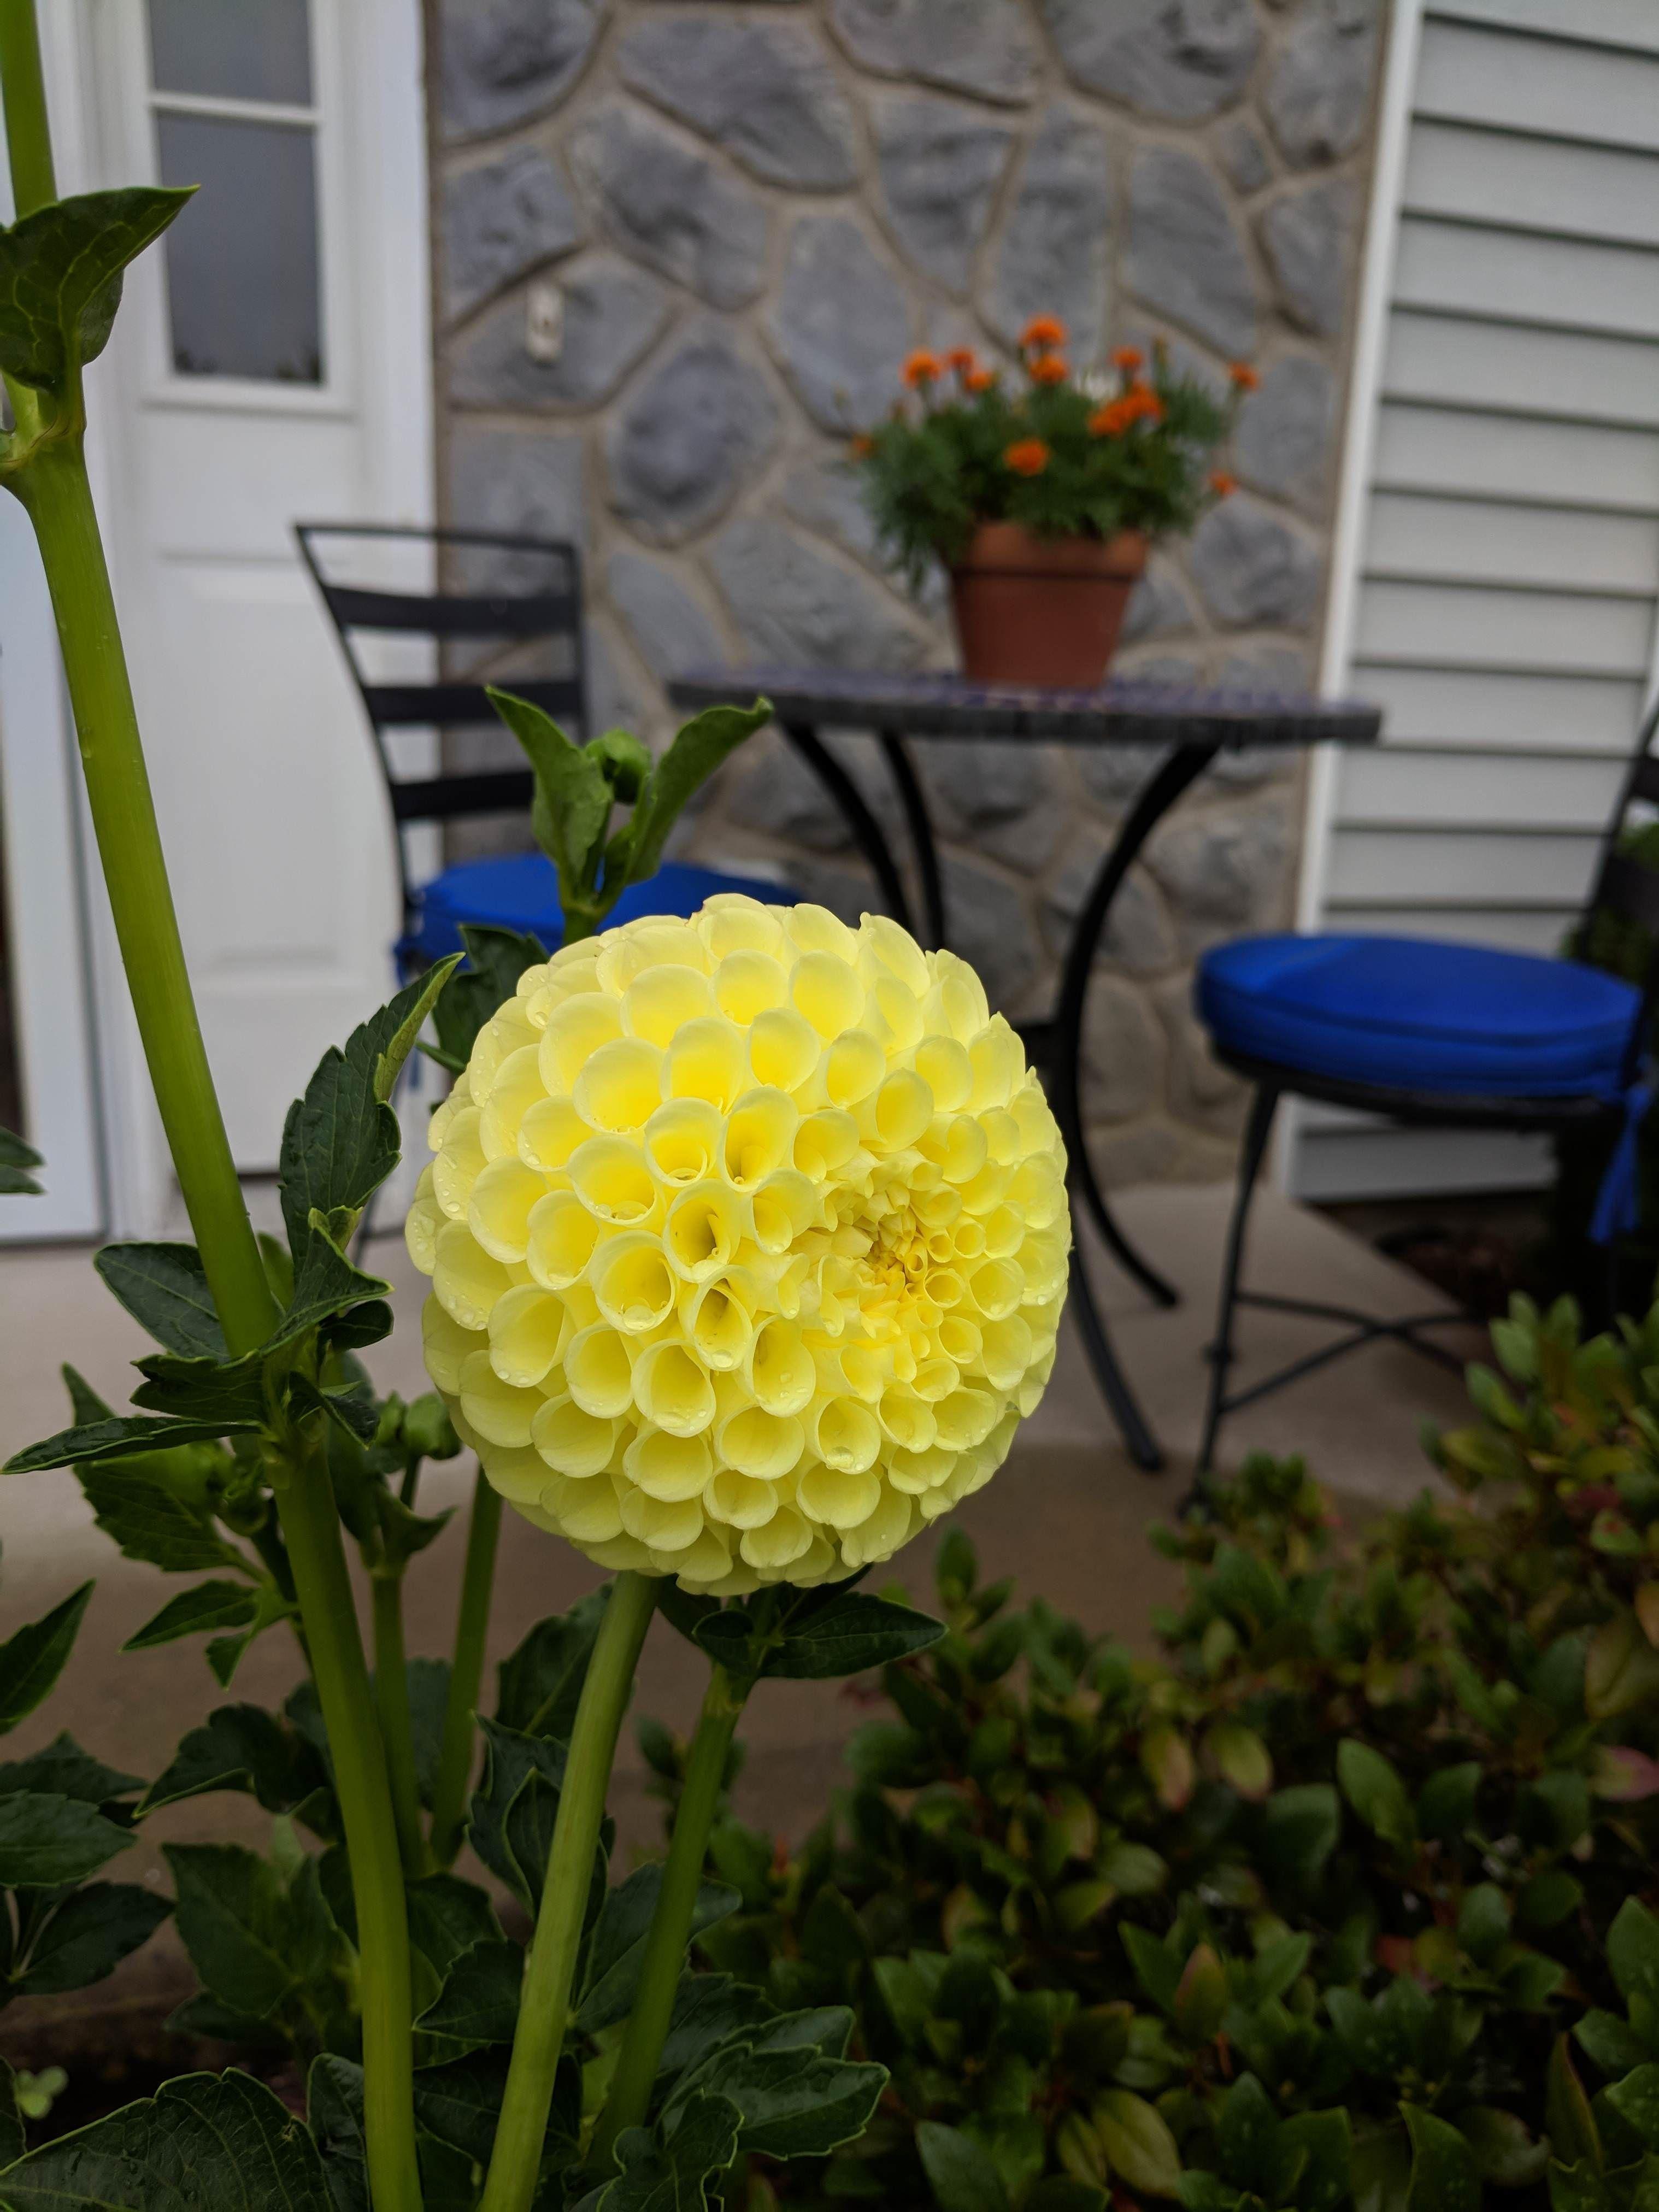 My Yellow Ball Dahlia Gardening Garden Diy Home Flowers Roses